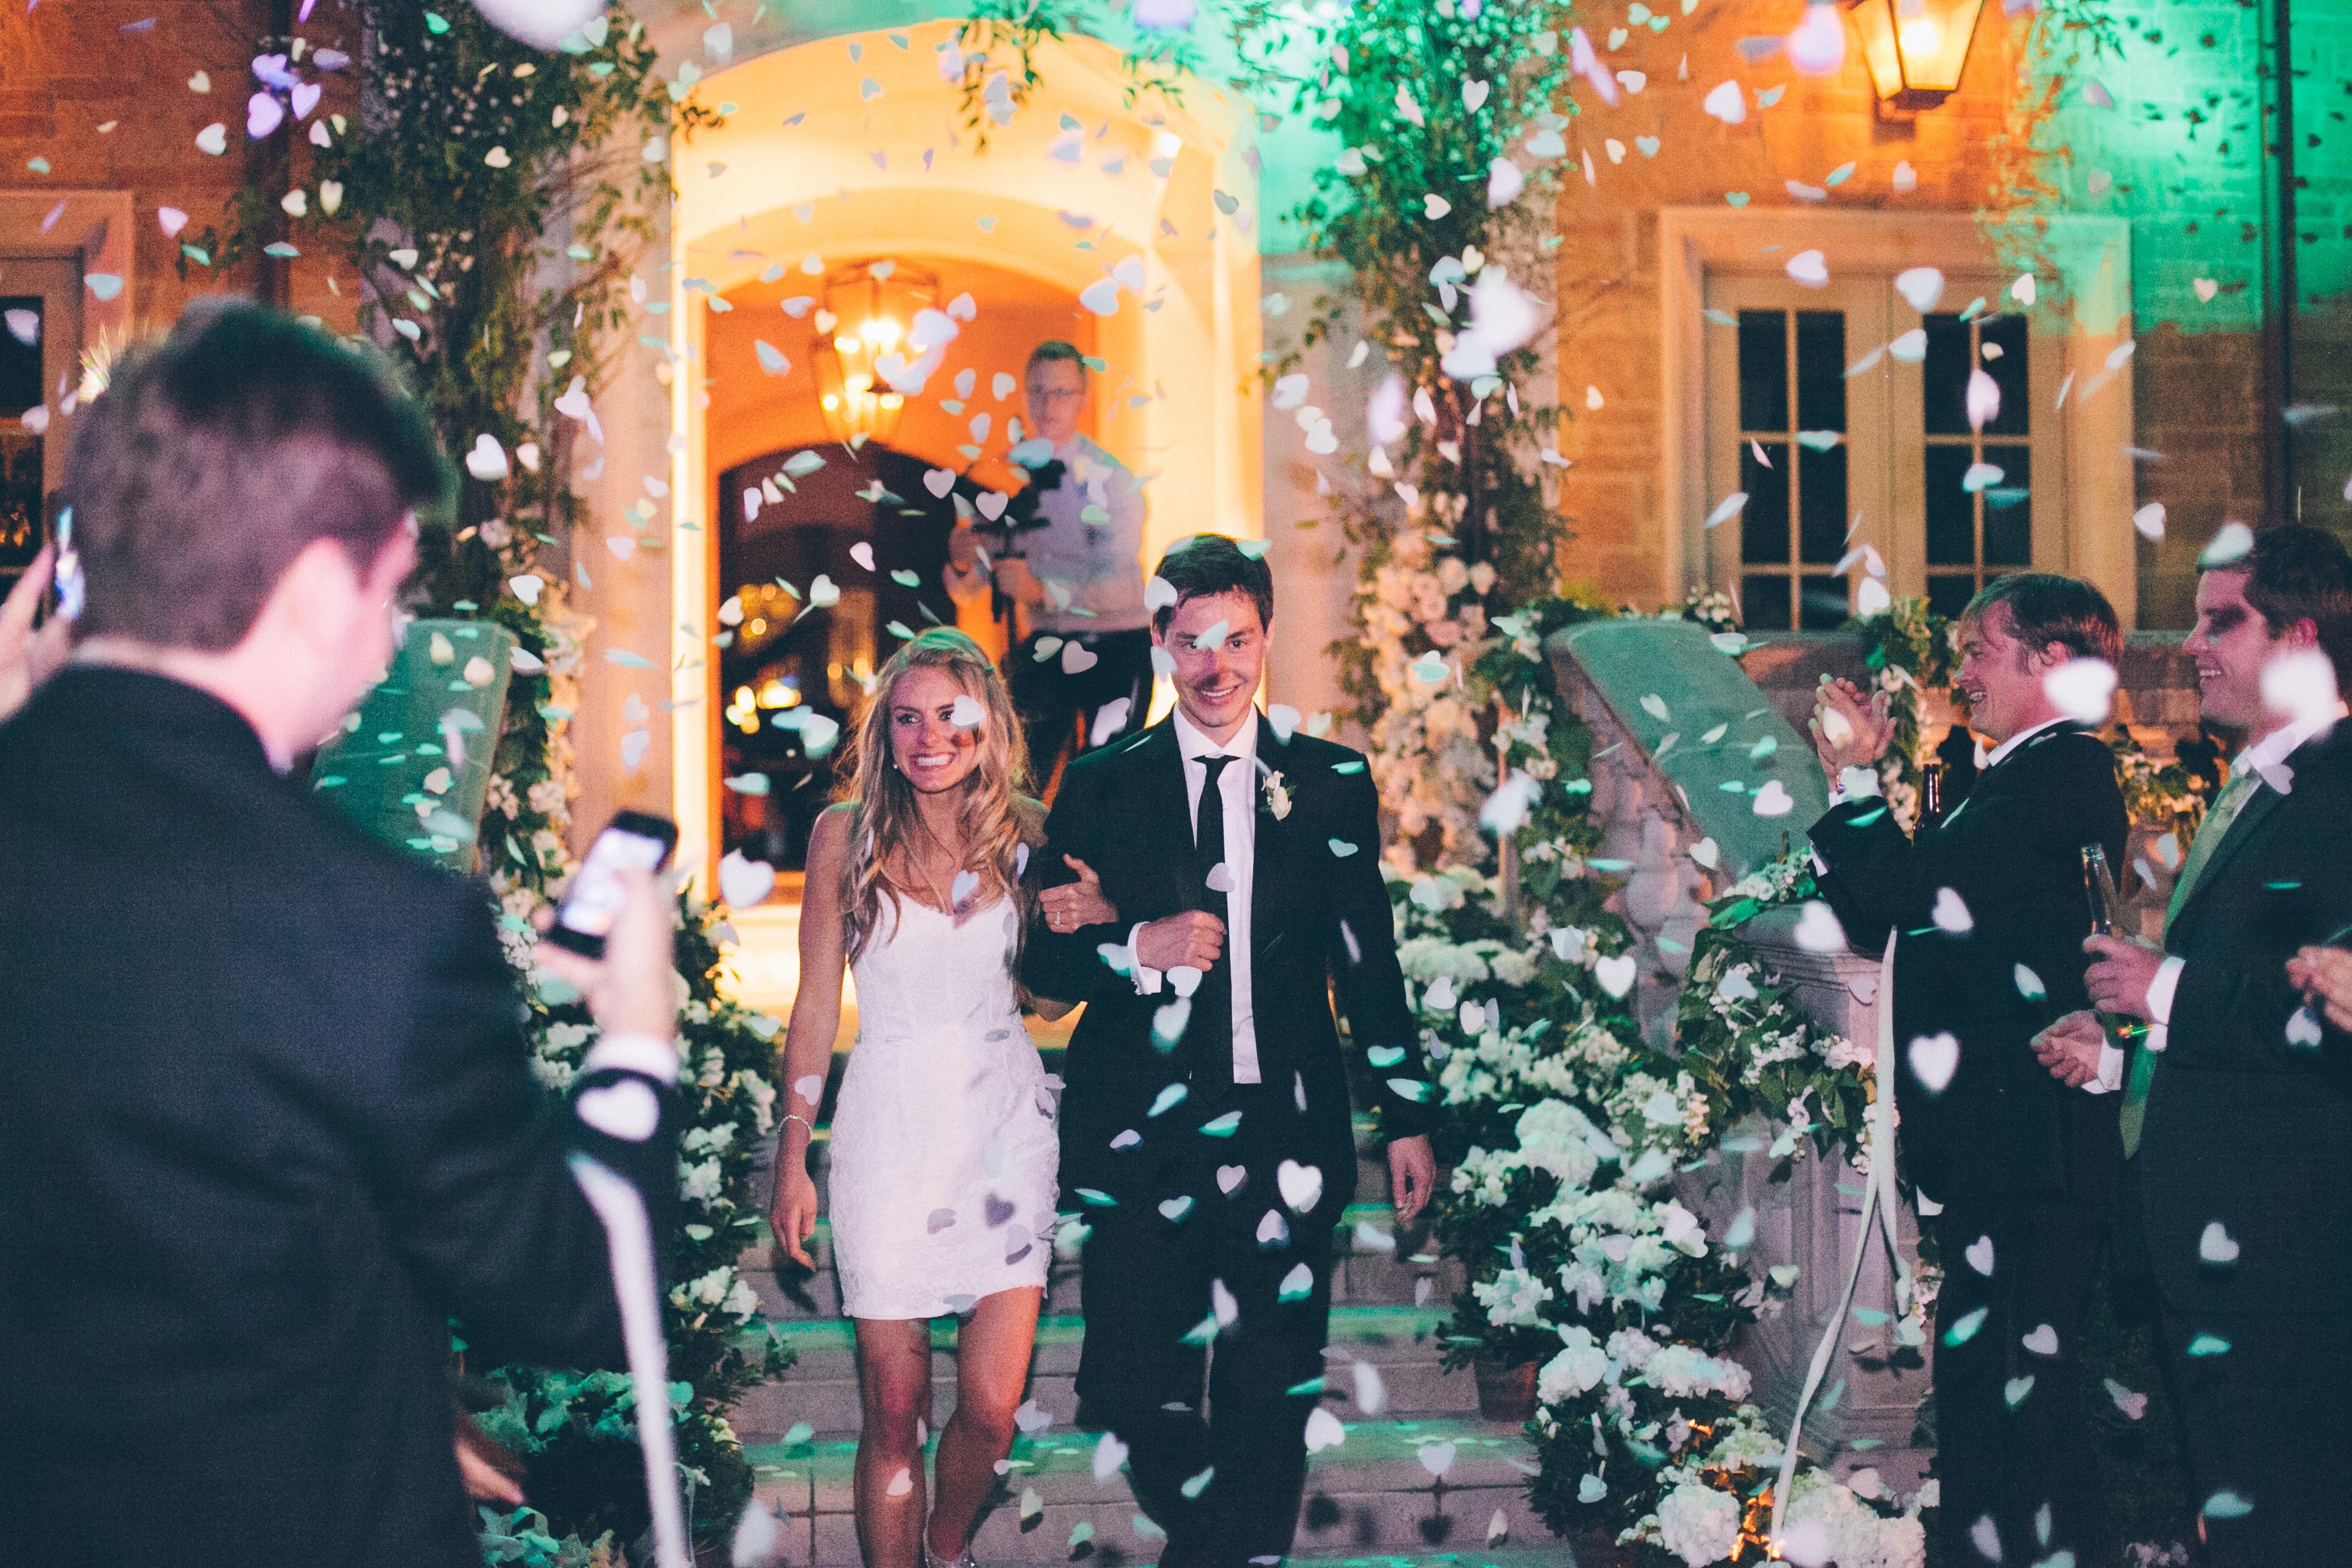 Bride in short wedding dress large heart shape confetti toss exit